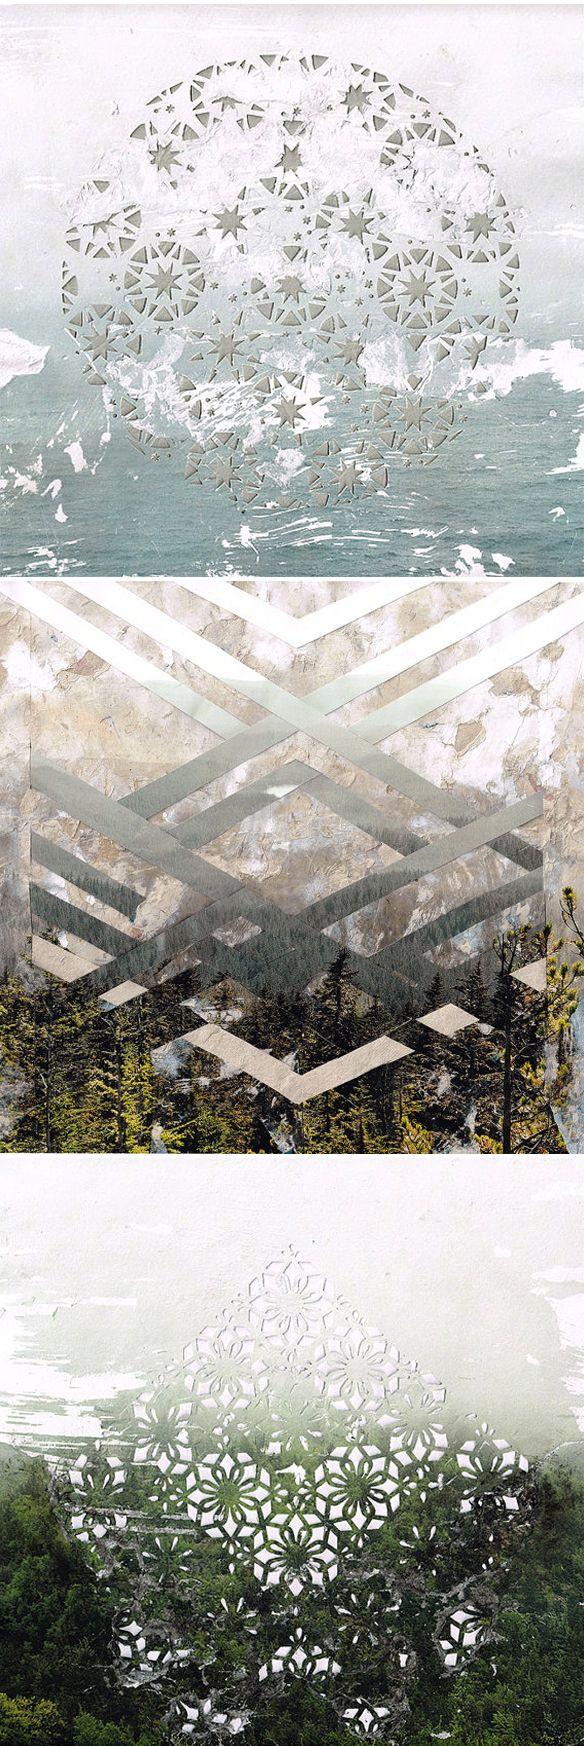 elise wehle - paper cutting/mixed media {landscapes}